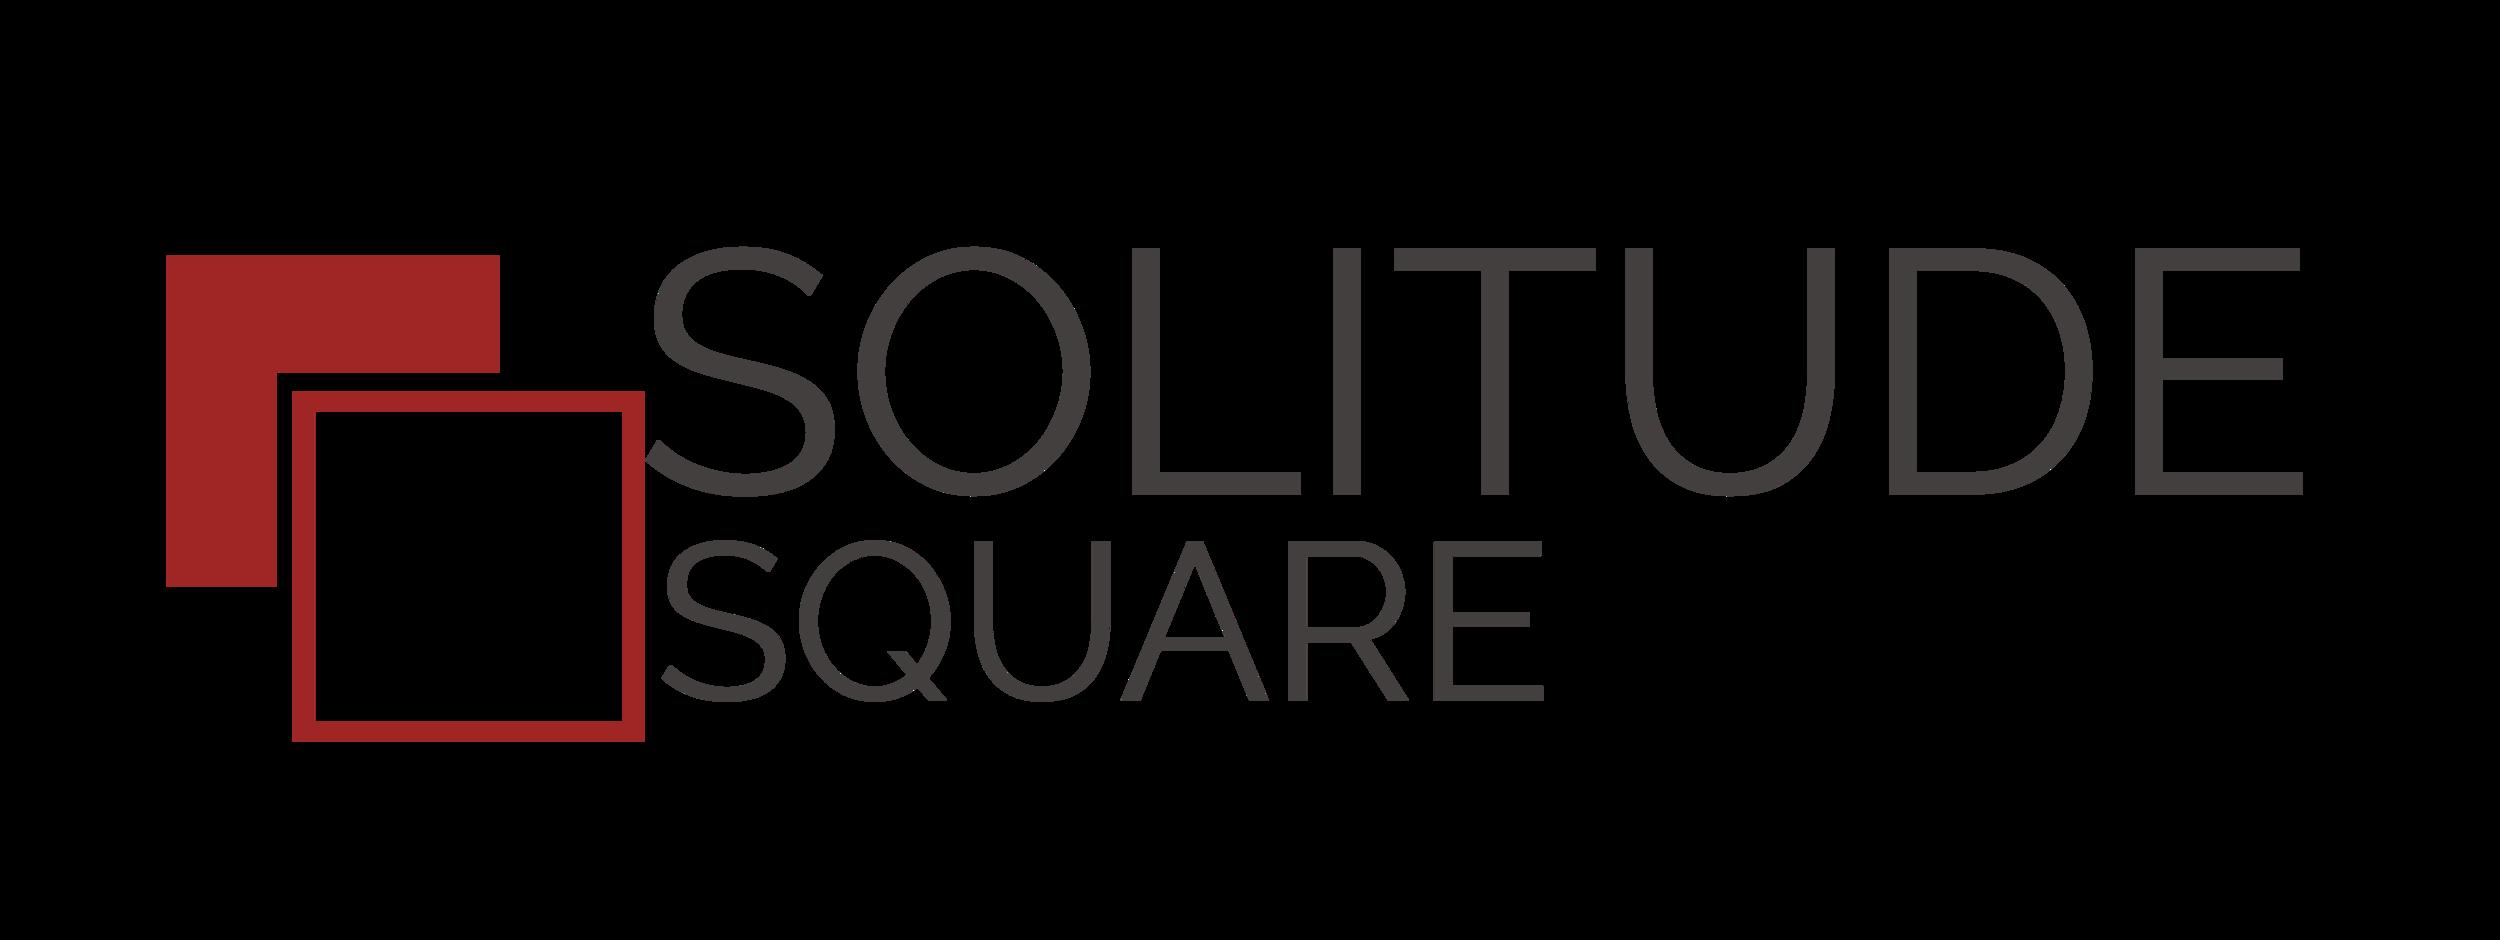 SOLITUDE-logo(1).png